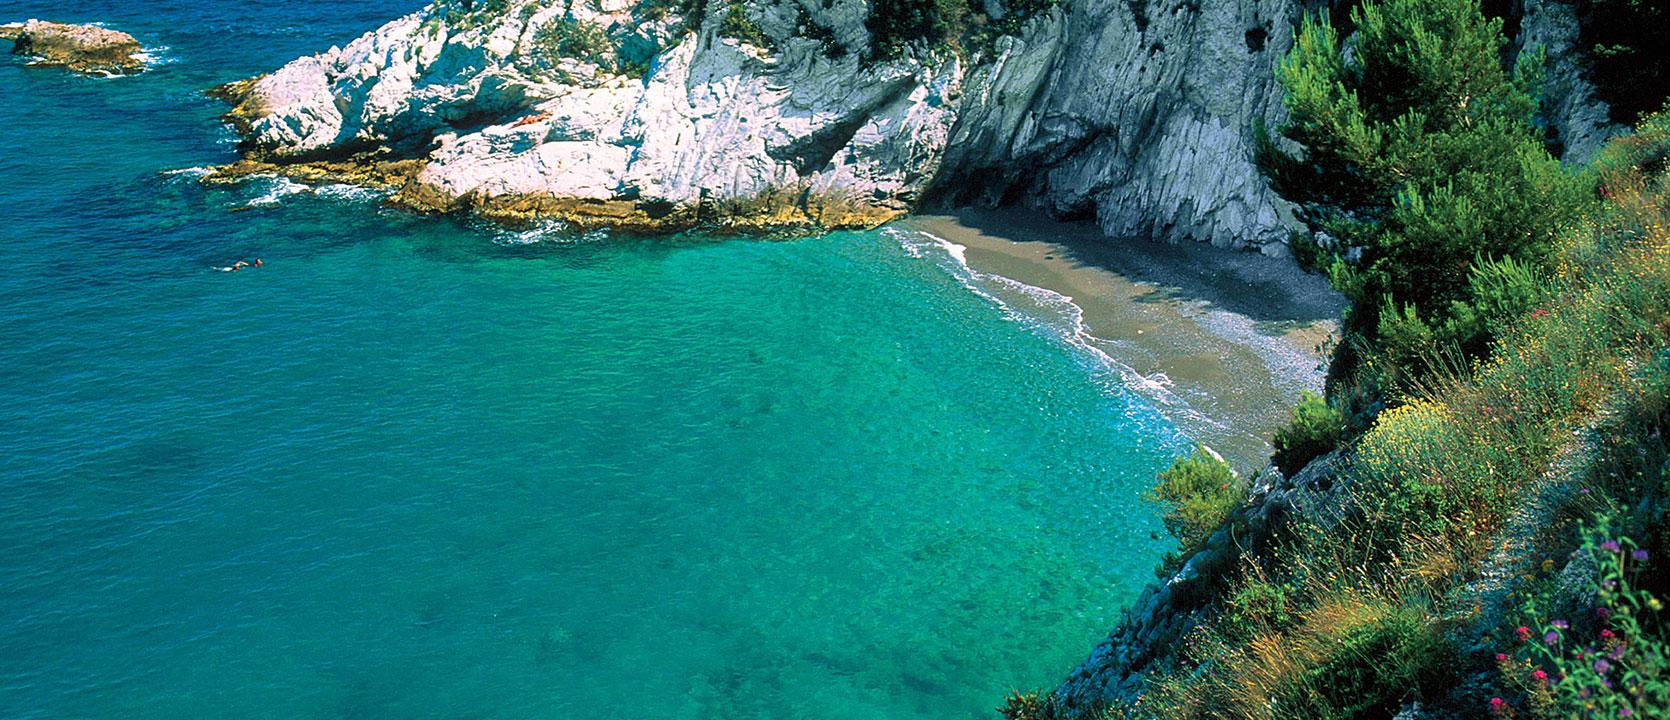 Relaxing at the seaside in Noli, Bergeggi, Finale Ligure, Spotorno